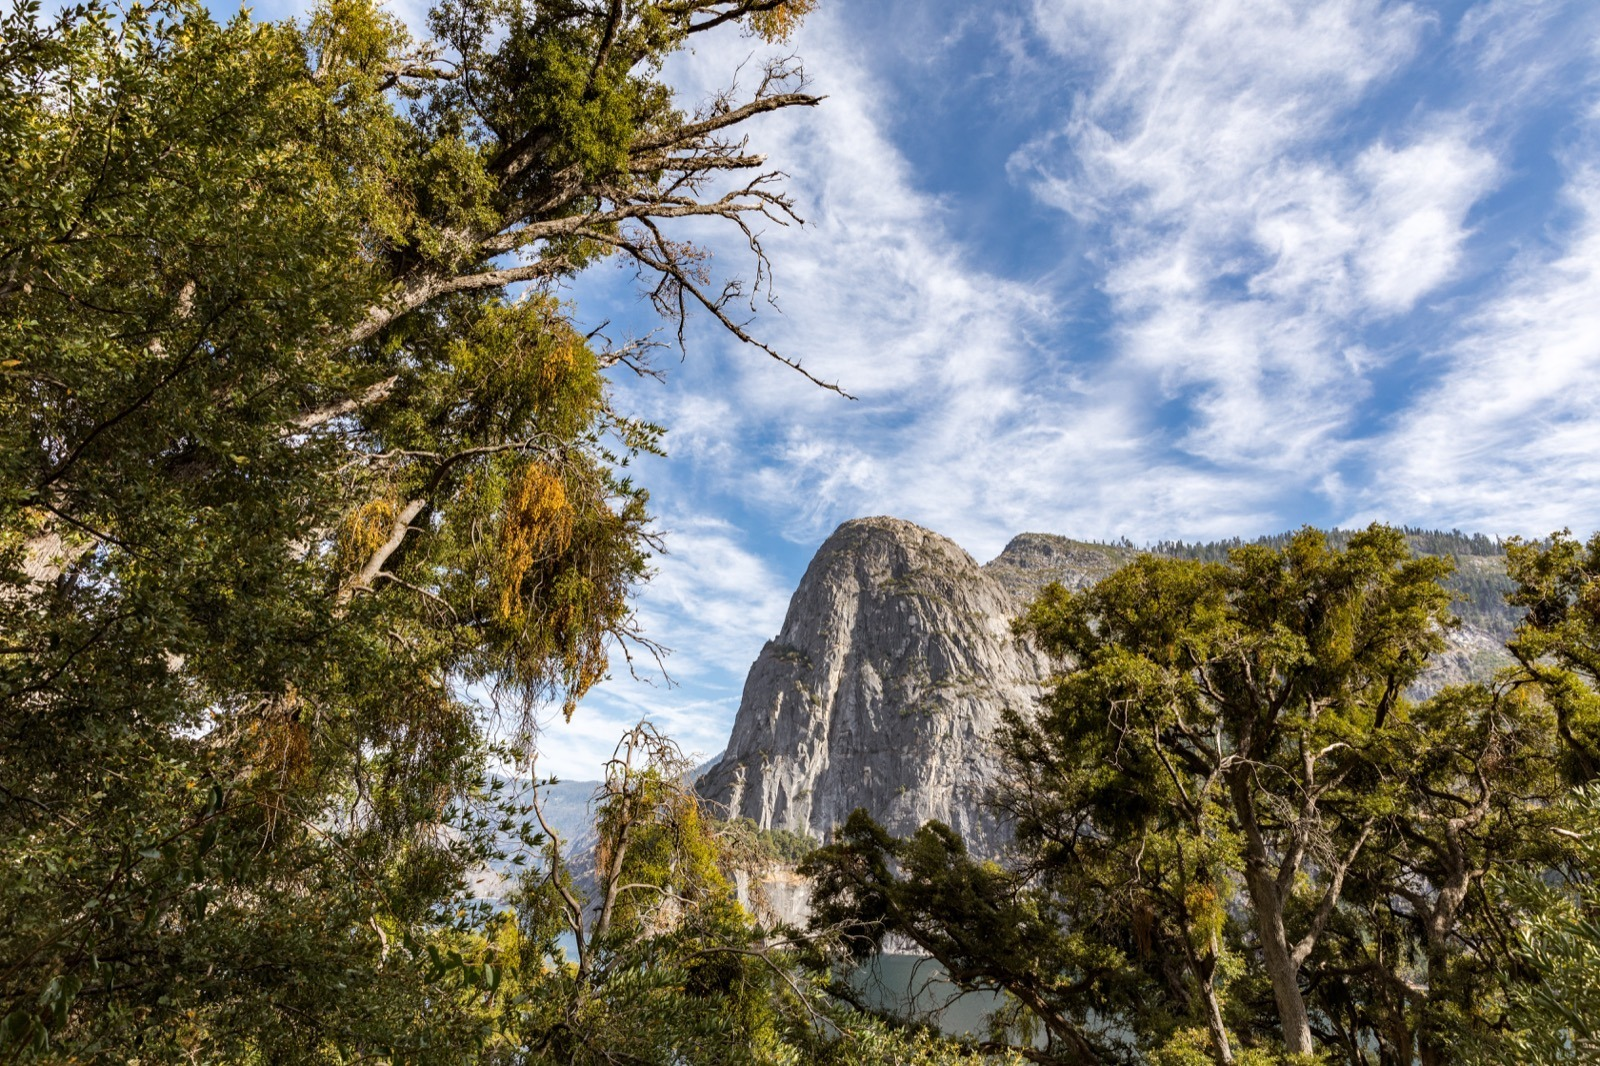 california-high-sierra-tuolumne-hetch-hetchy-reservoir-hike-wapama-falls-yosemite-national-park-3